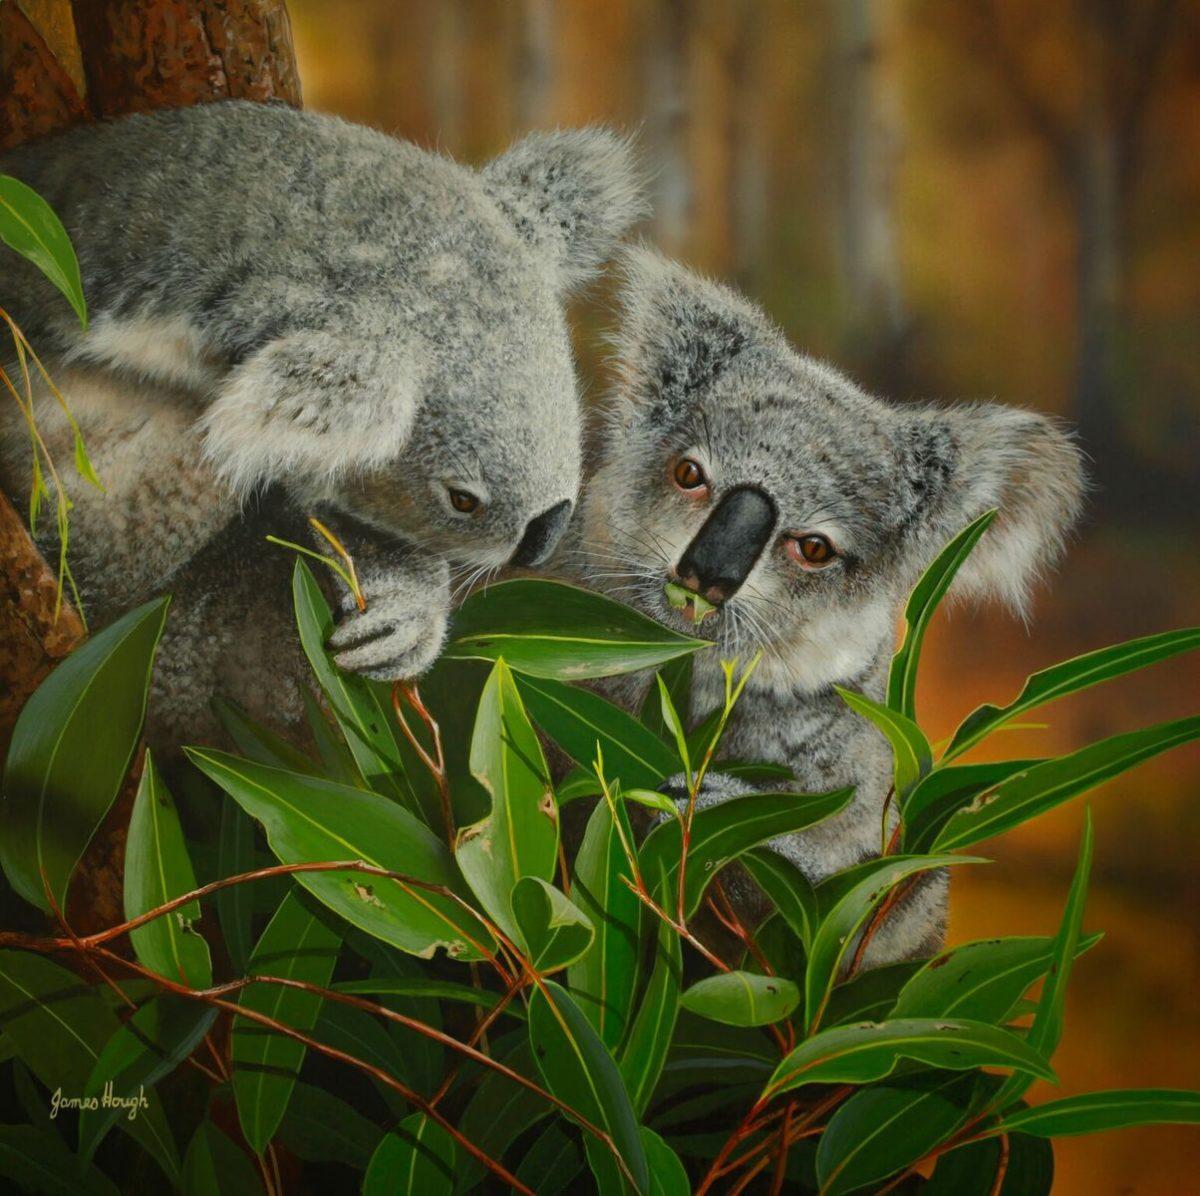 Koala Painting Painting James Hough